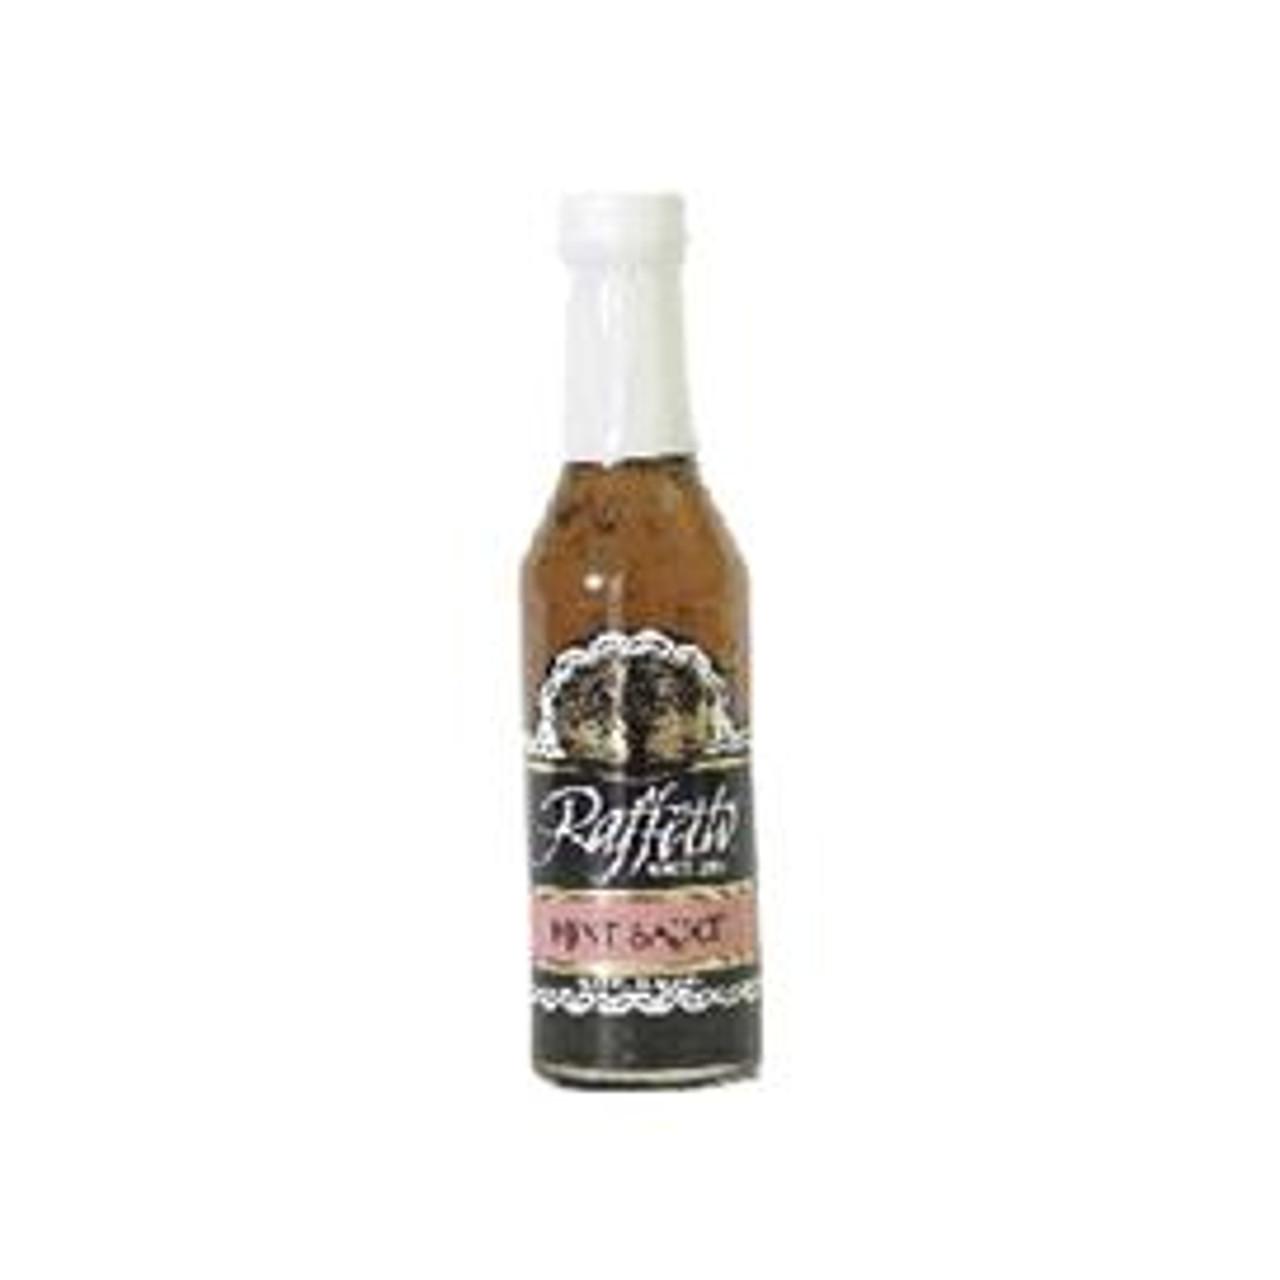 Raffetto Mint Sauce